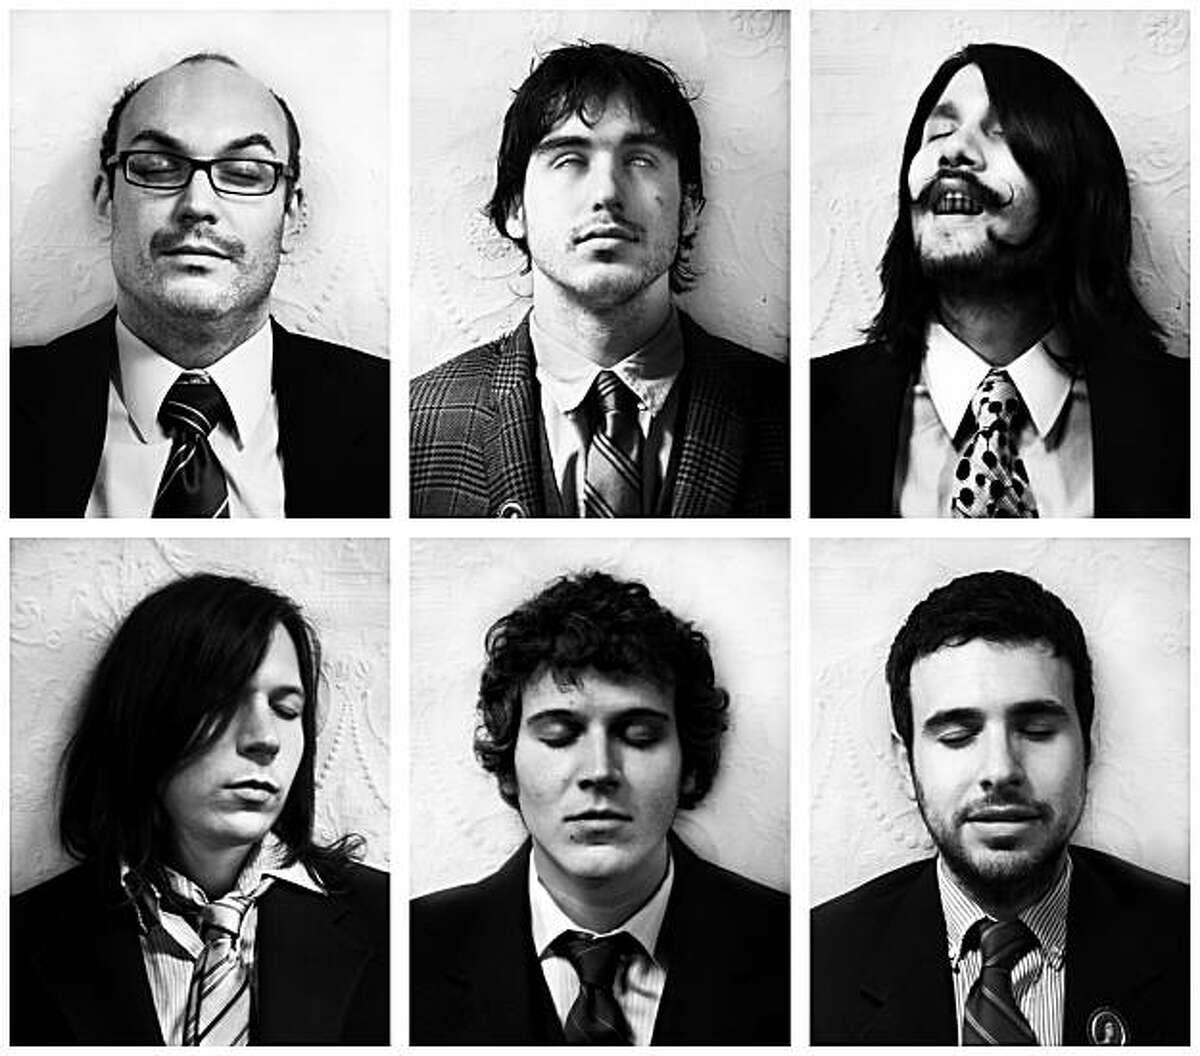 Maus Haus is (clockwise from top left) Aaron Weiss, Sean Mabry, Tom Hurlbut, Joe Genden, Josh Rampage, Jason Kick.